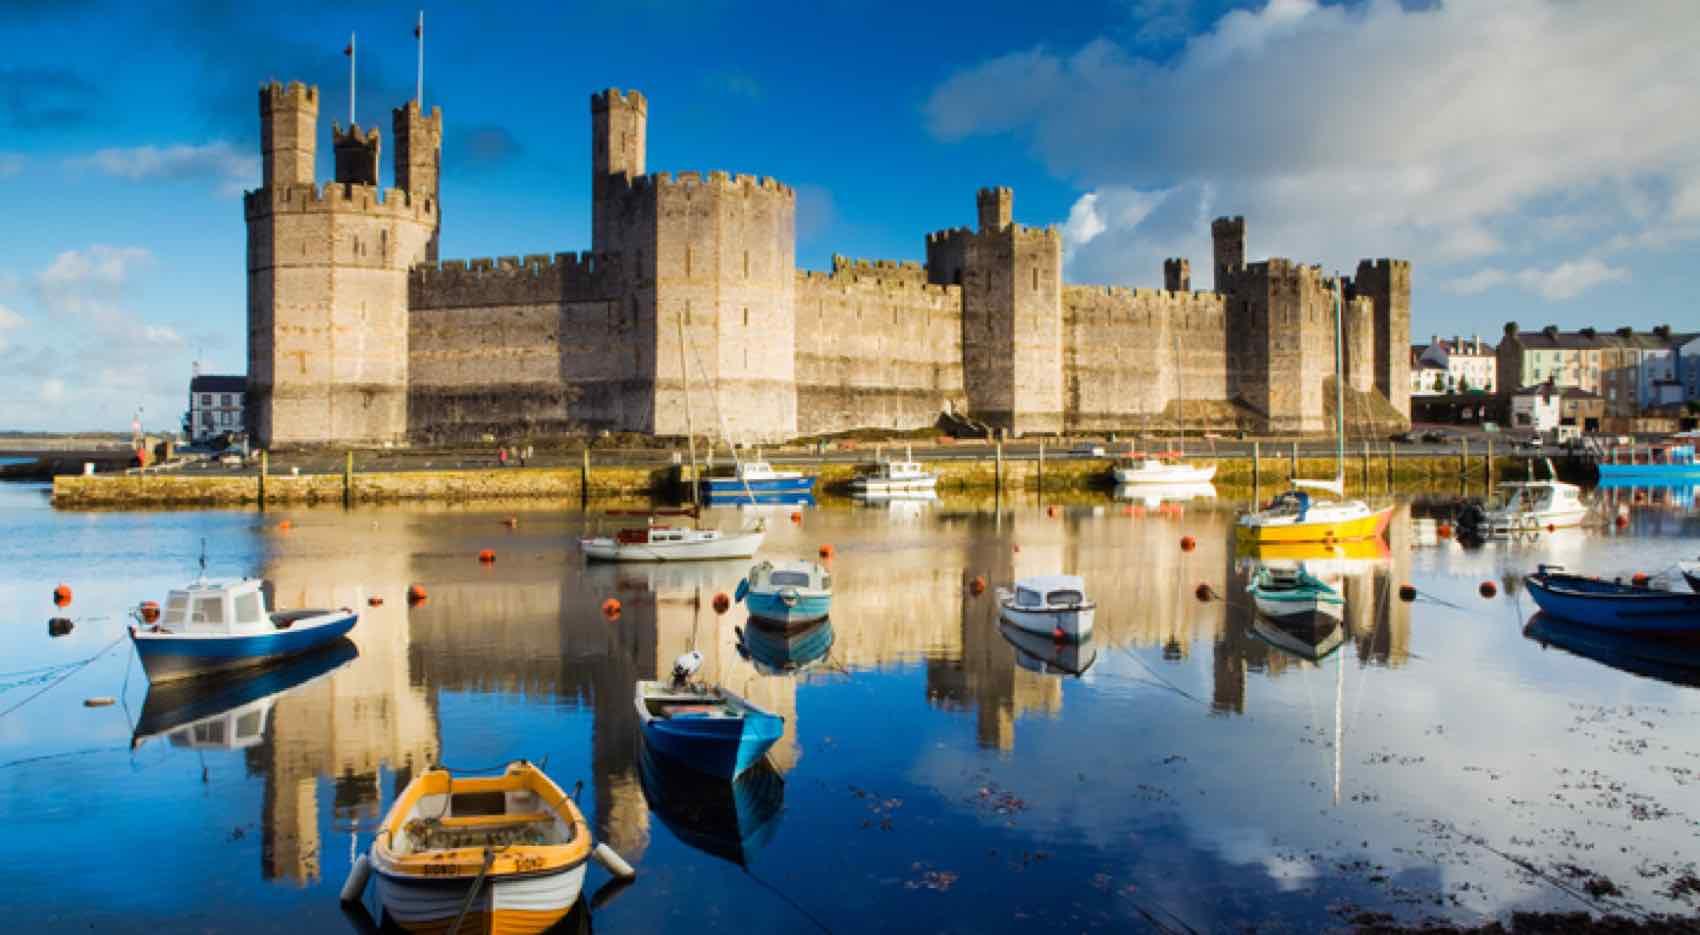 Slottet Caernarfon i området Menai i Wales.